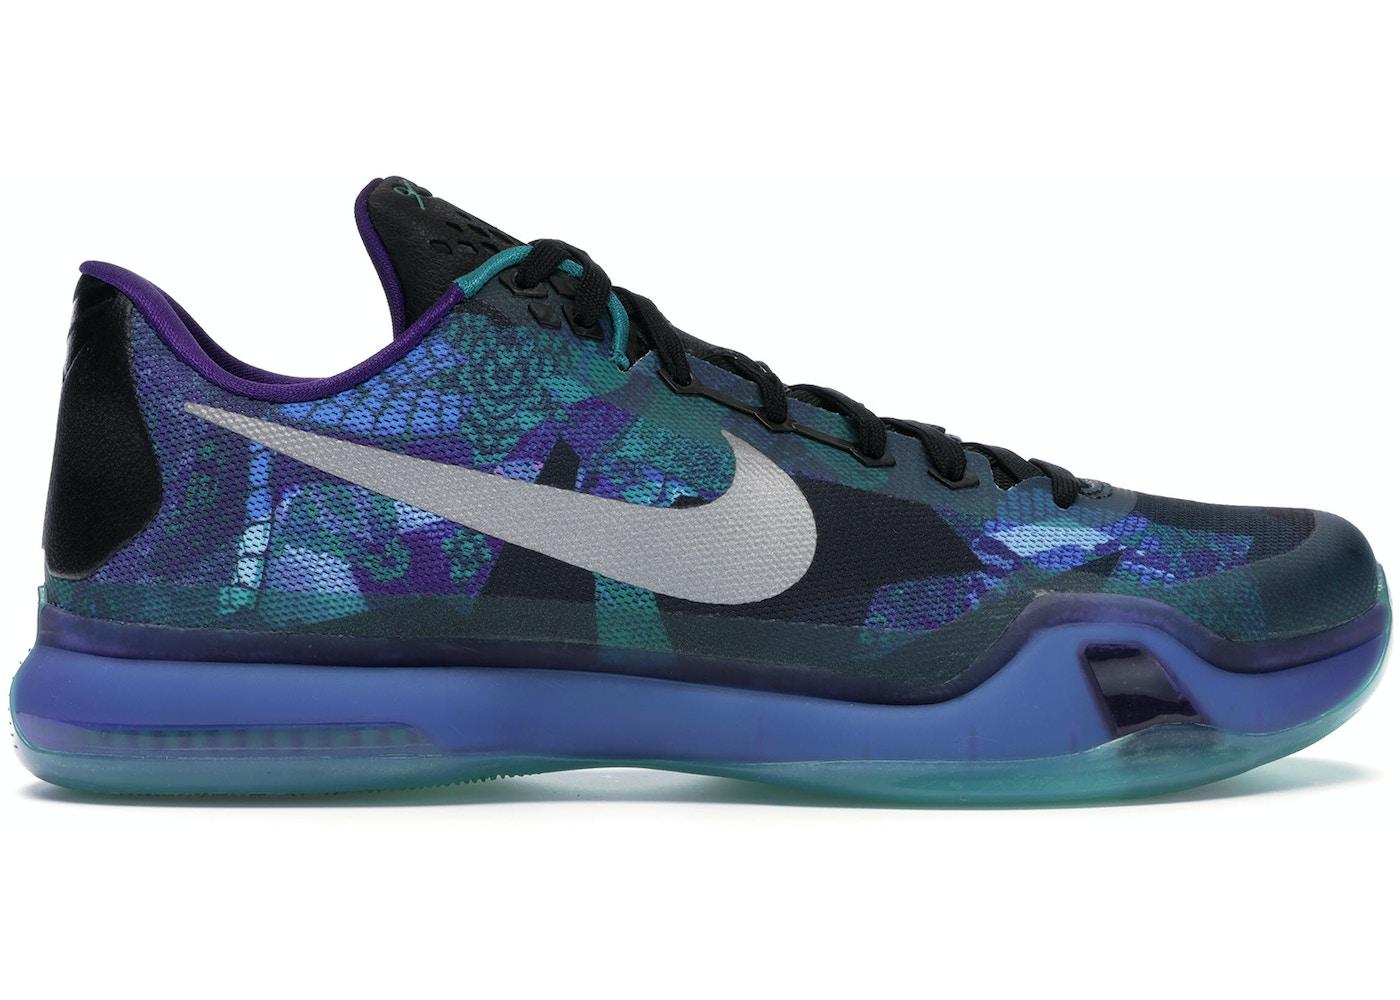 newest e5b2a 6cc41 Buy Nike Kobe Shoes   Deadstock Sneakers